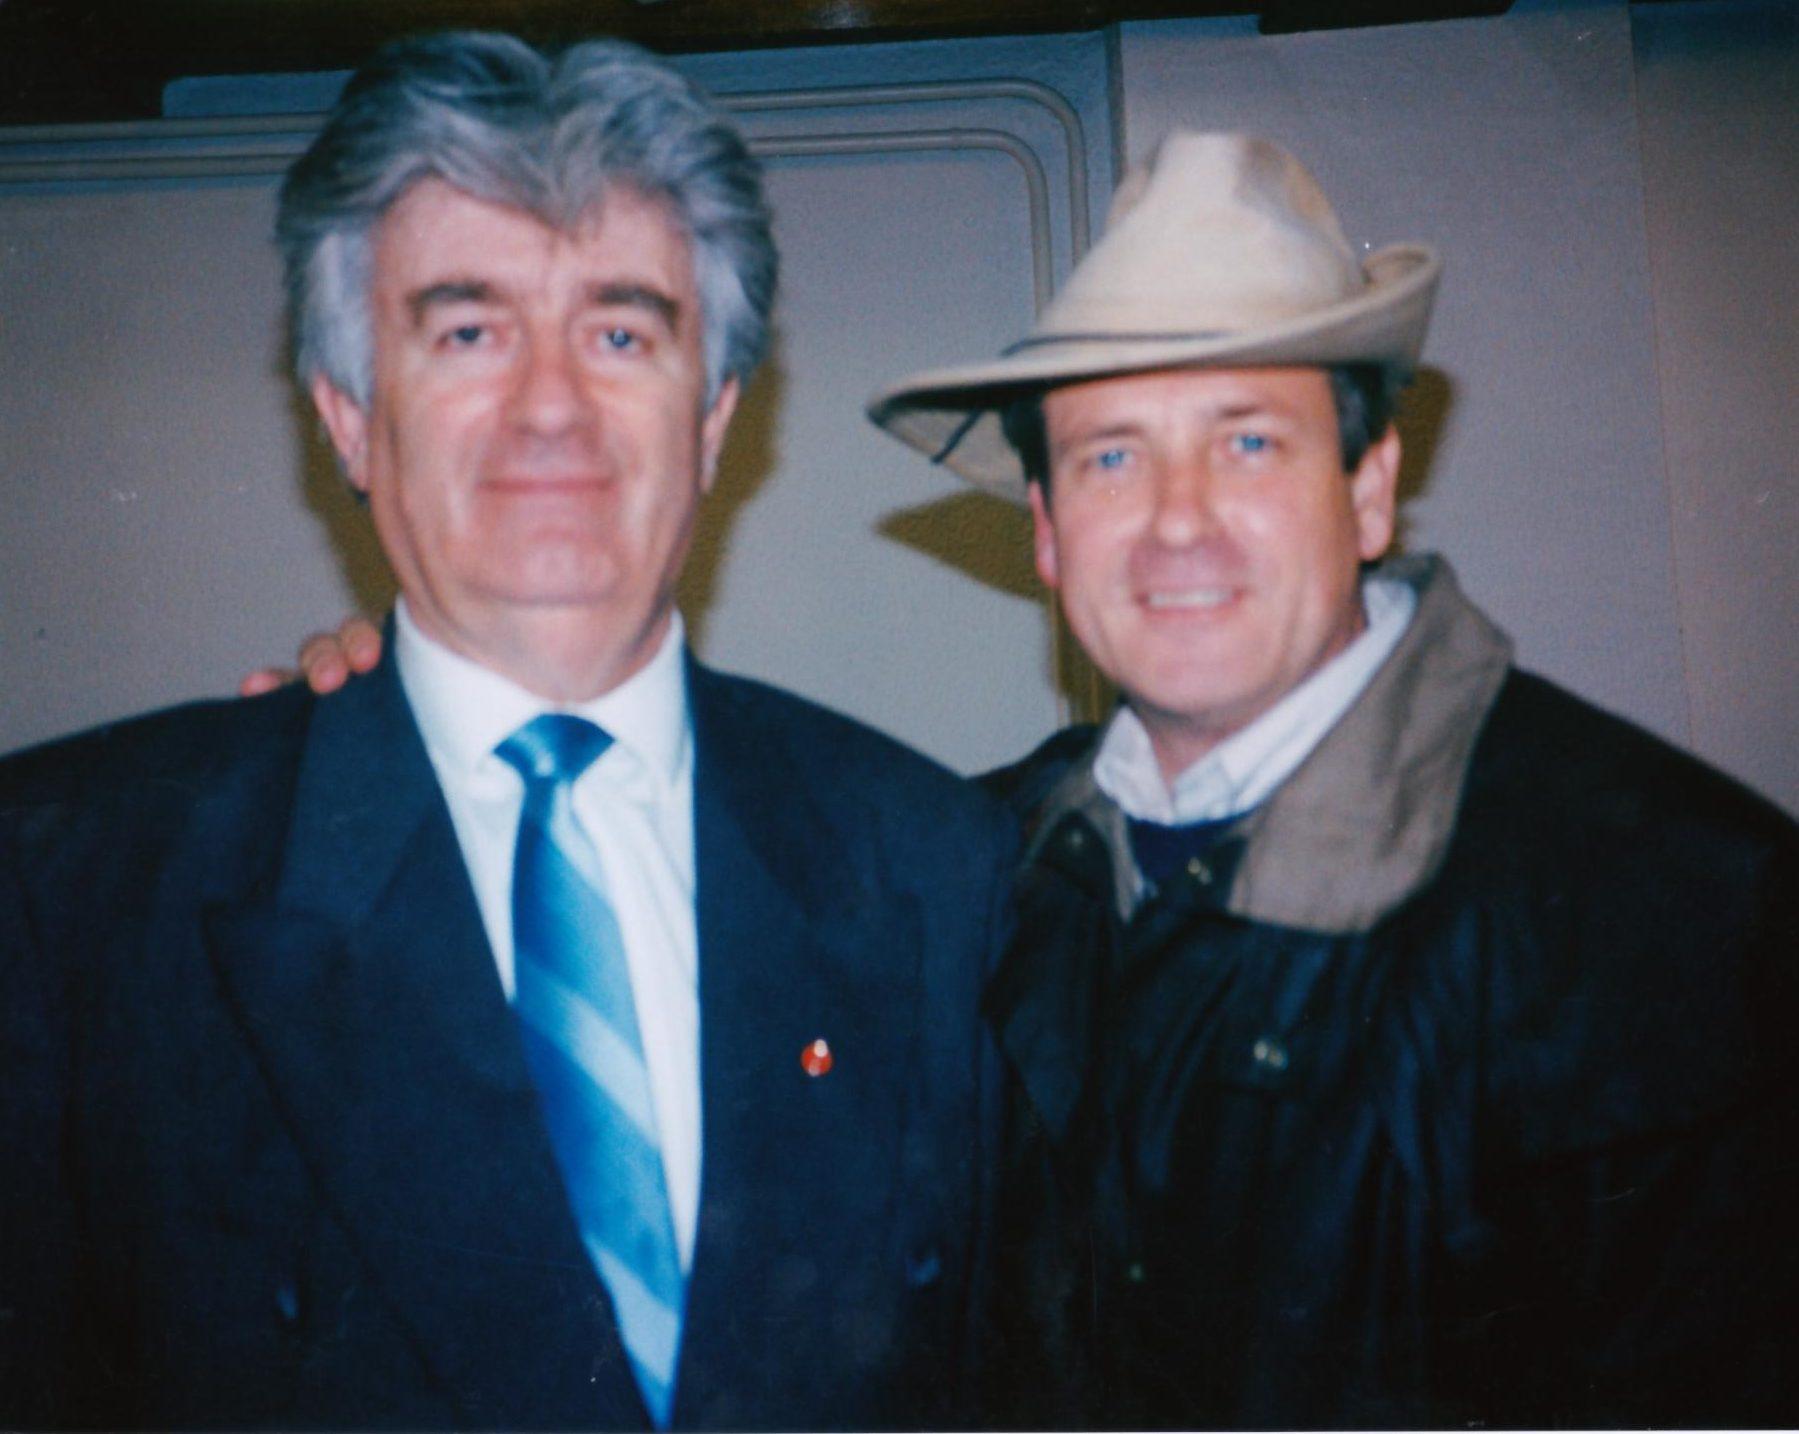 Radovan Karadžić -War criminal -with David